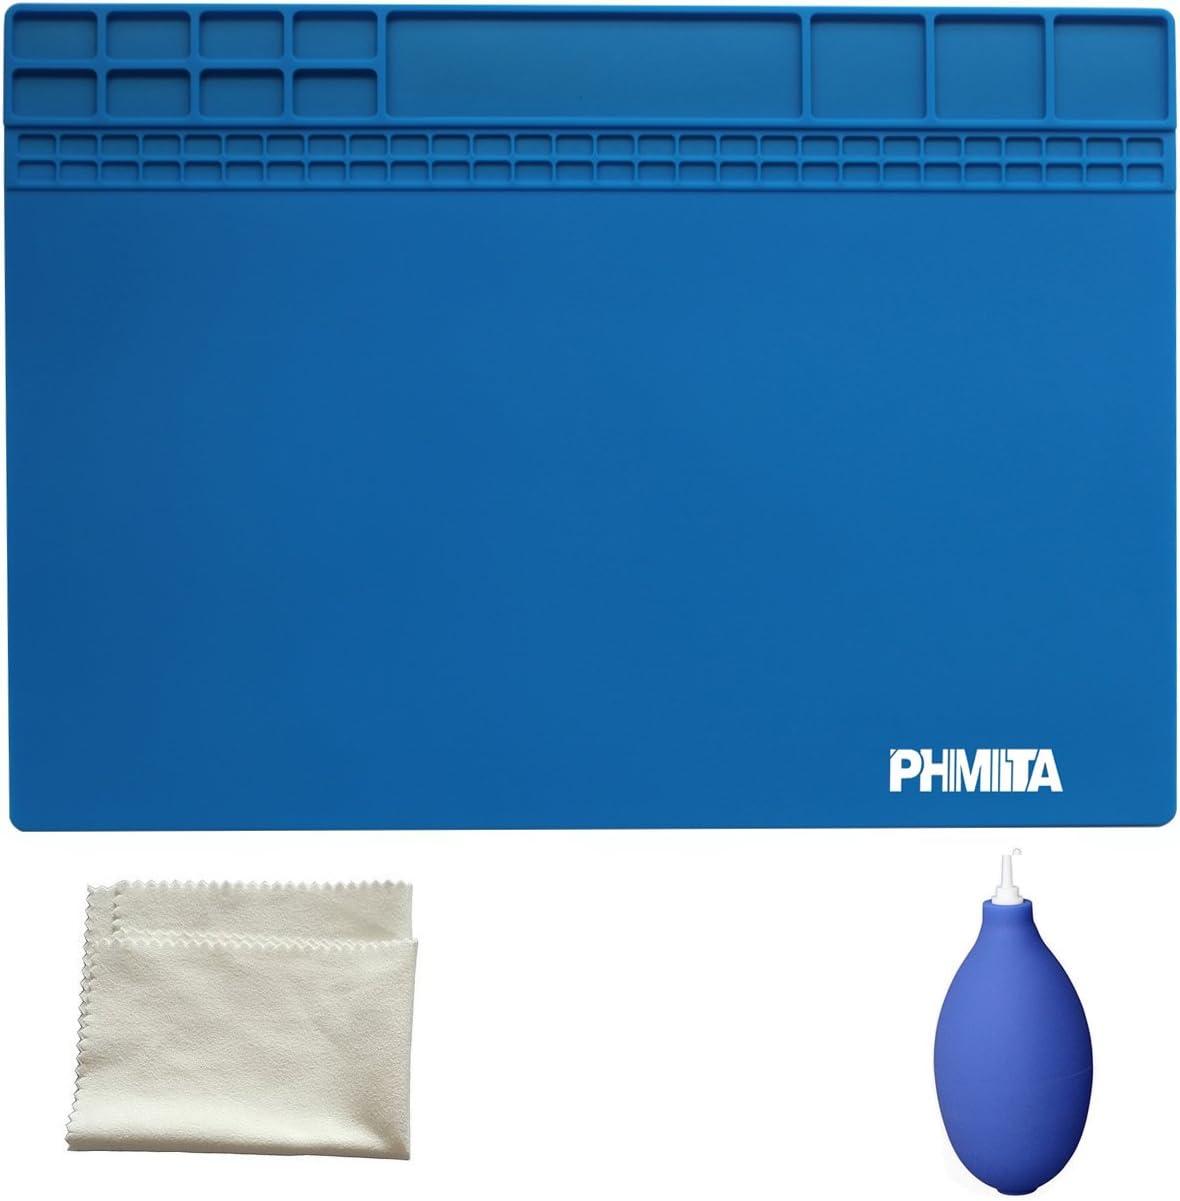 PHIMIITA Soldadura de Mat Silicone Estera de Soldadura Magnetic Project Working Pad 35x25, Dark Blue